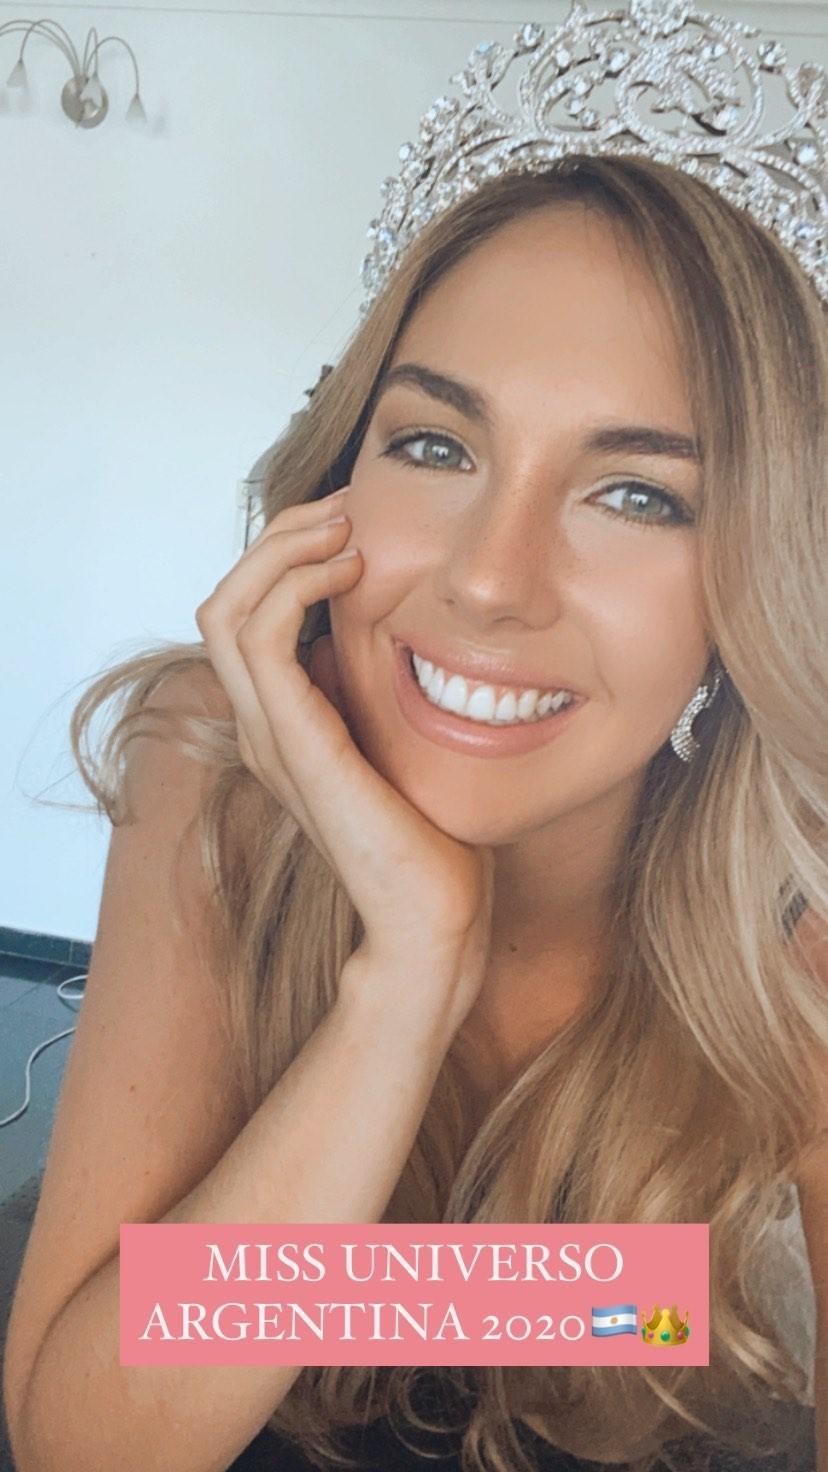 alina akselrad, miss argentina universo 2020. Munhe821